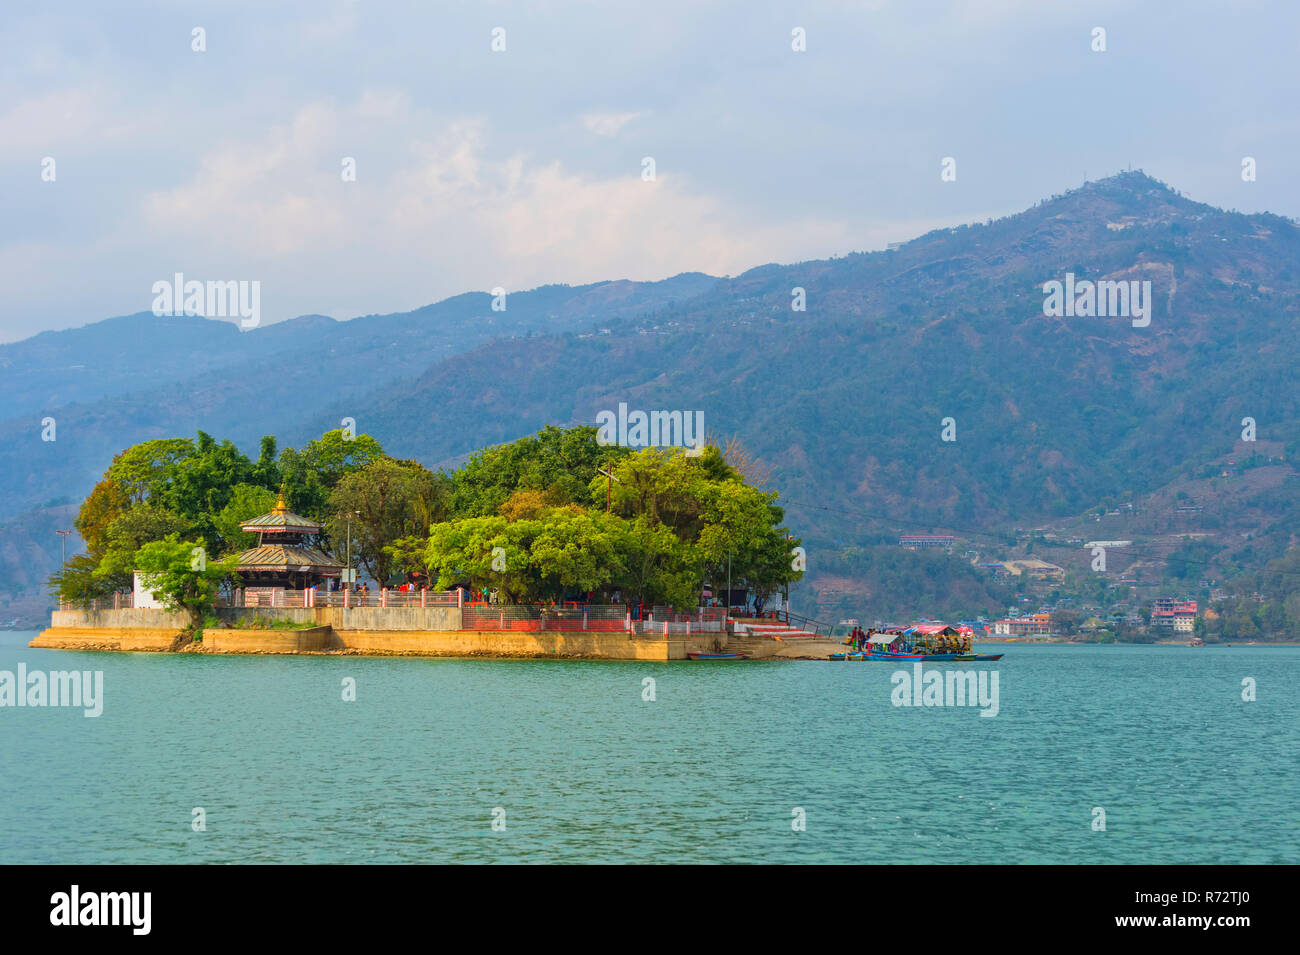 Island on Phewa Lake, Pokhara, Nepal - Stock Image